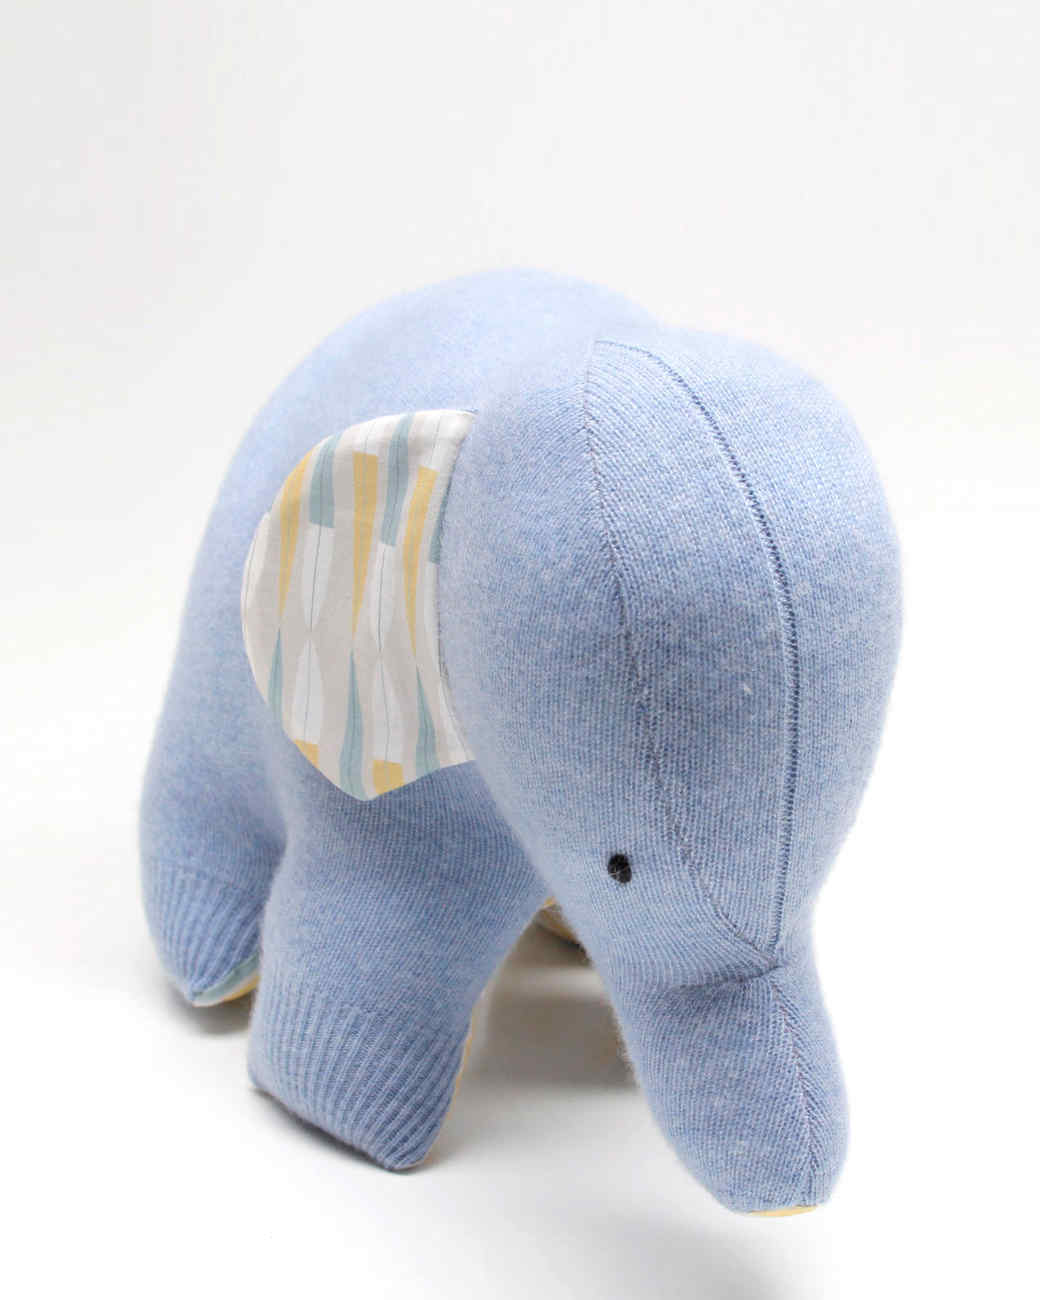 caitli-wicker-stuffed-elephant-0714.jpg